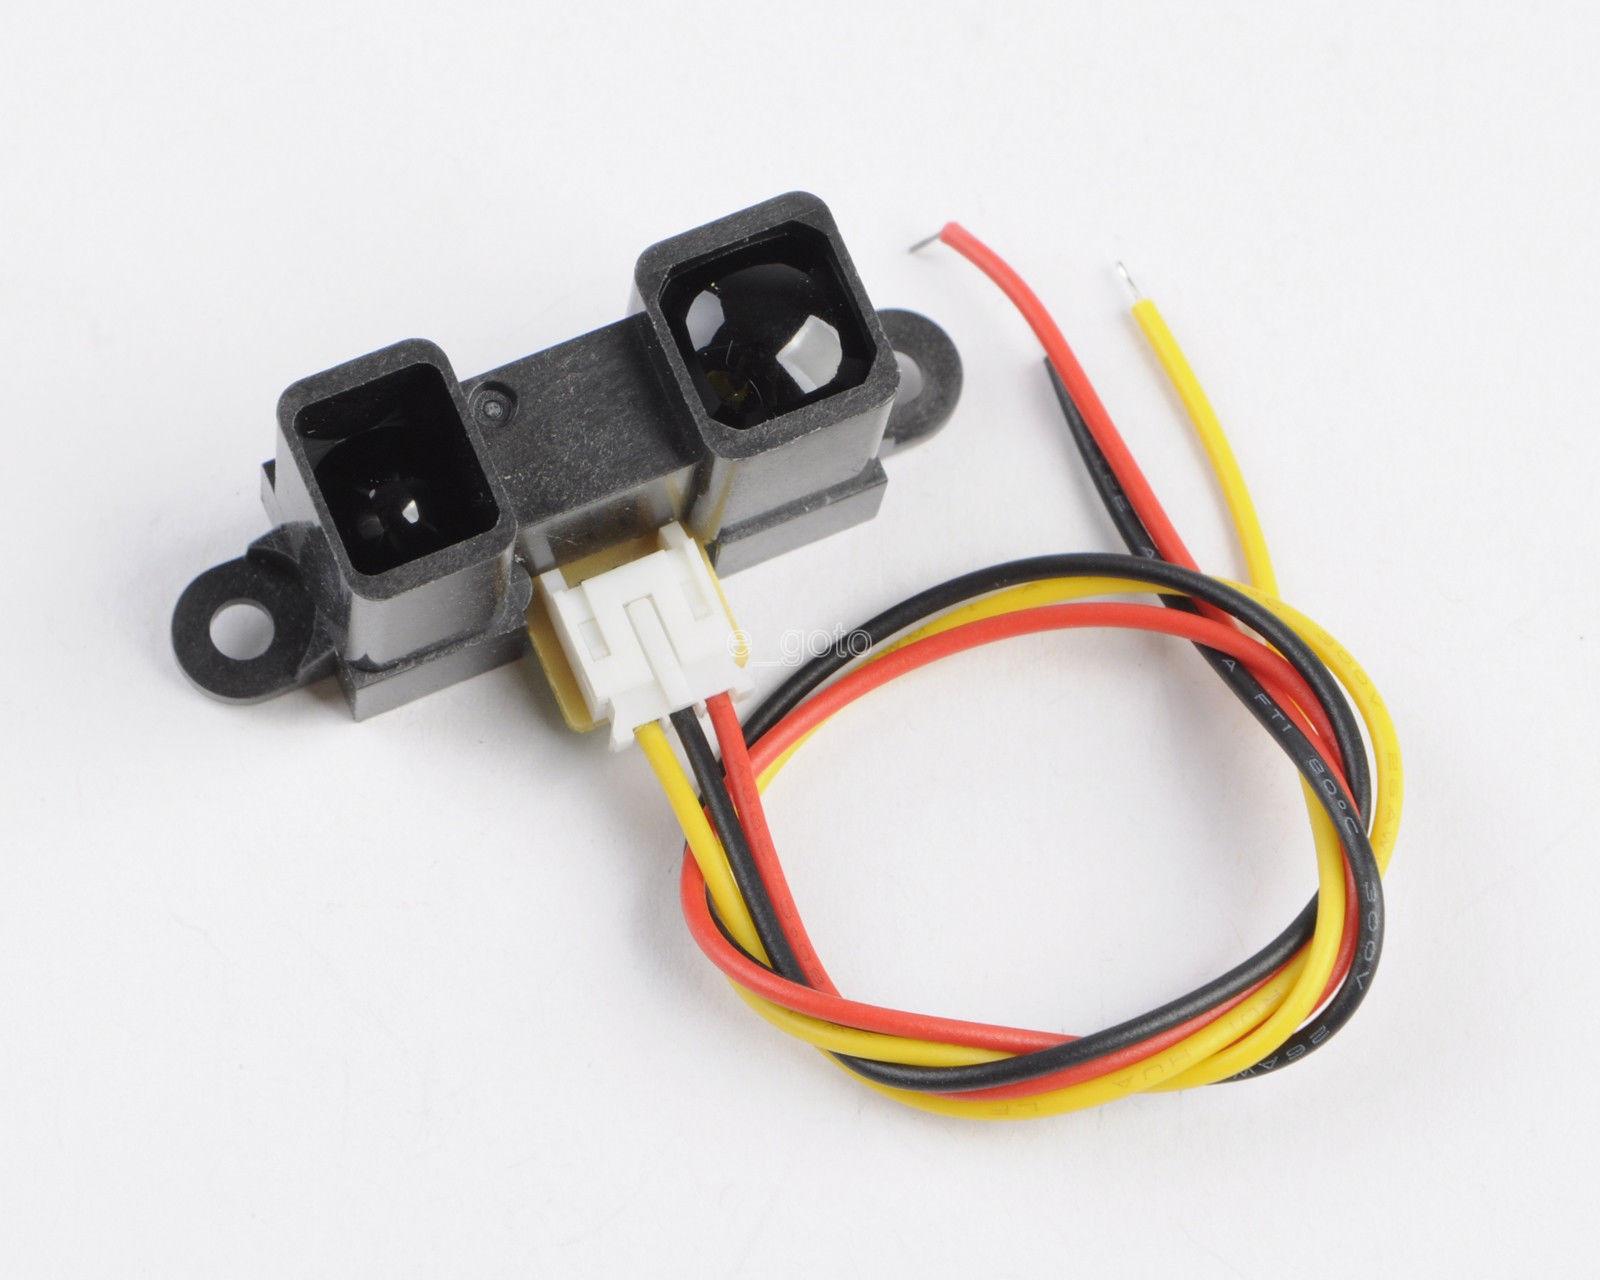 Sharp infrared distance sensor 20 - 150 CM